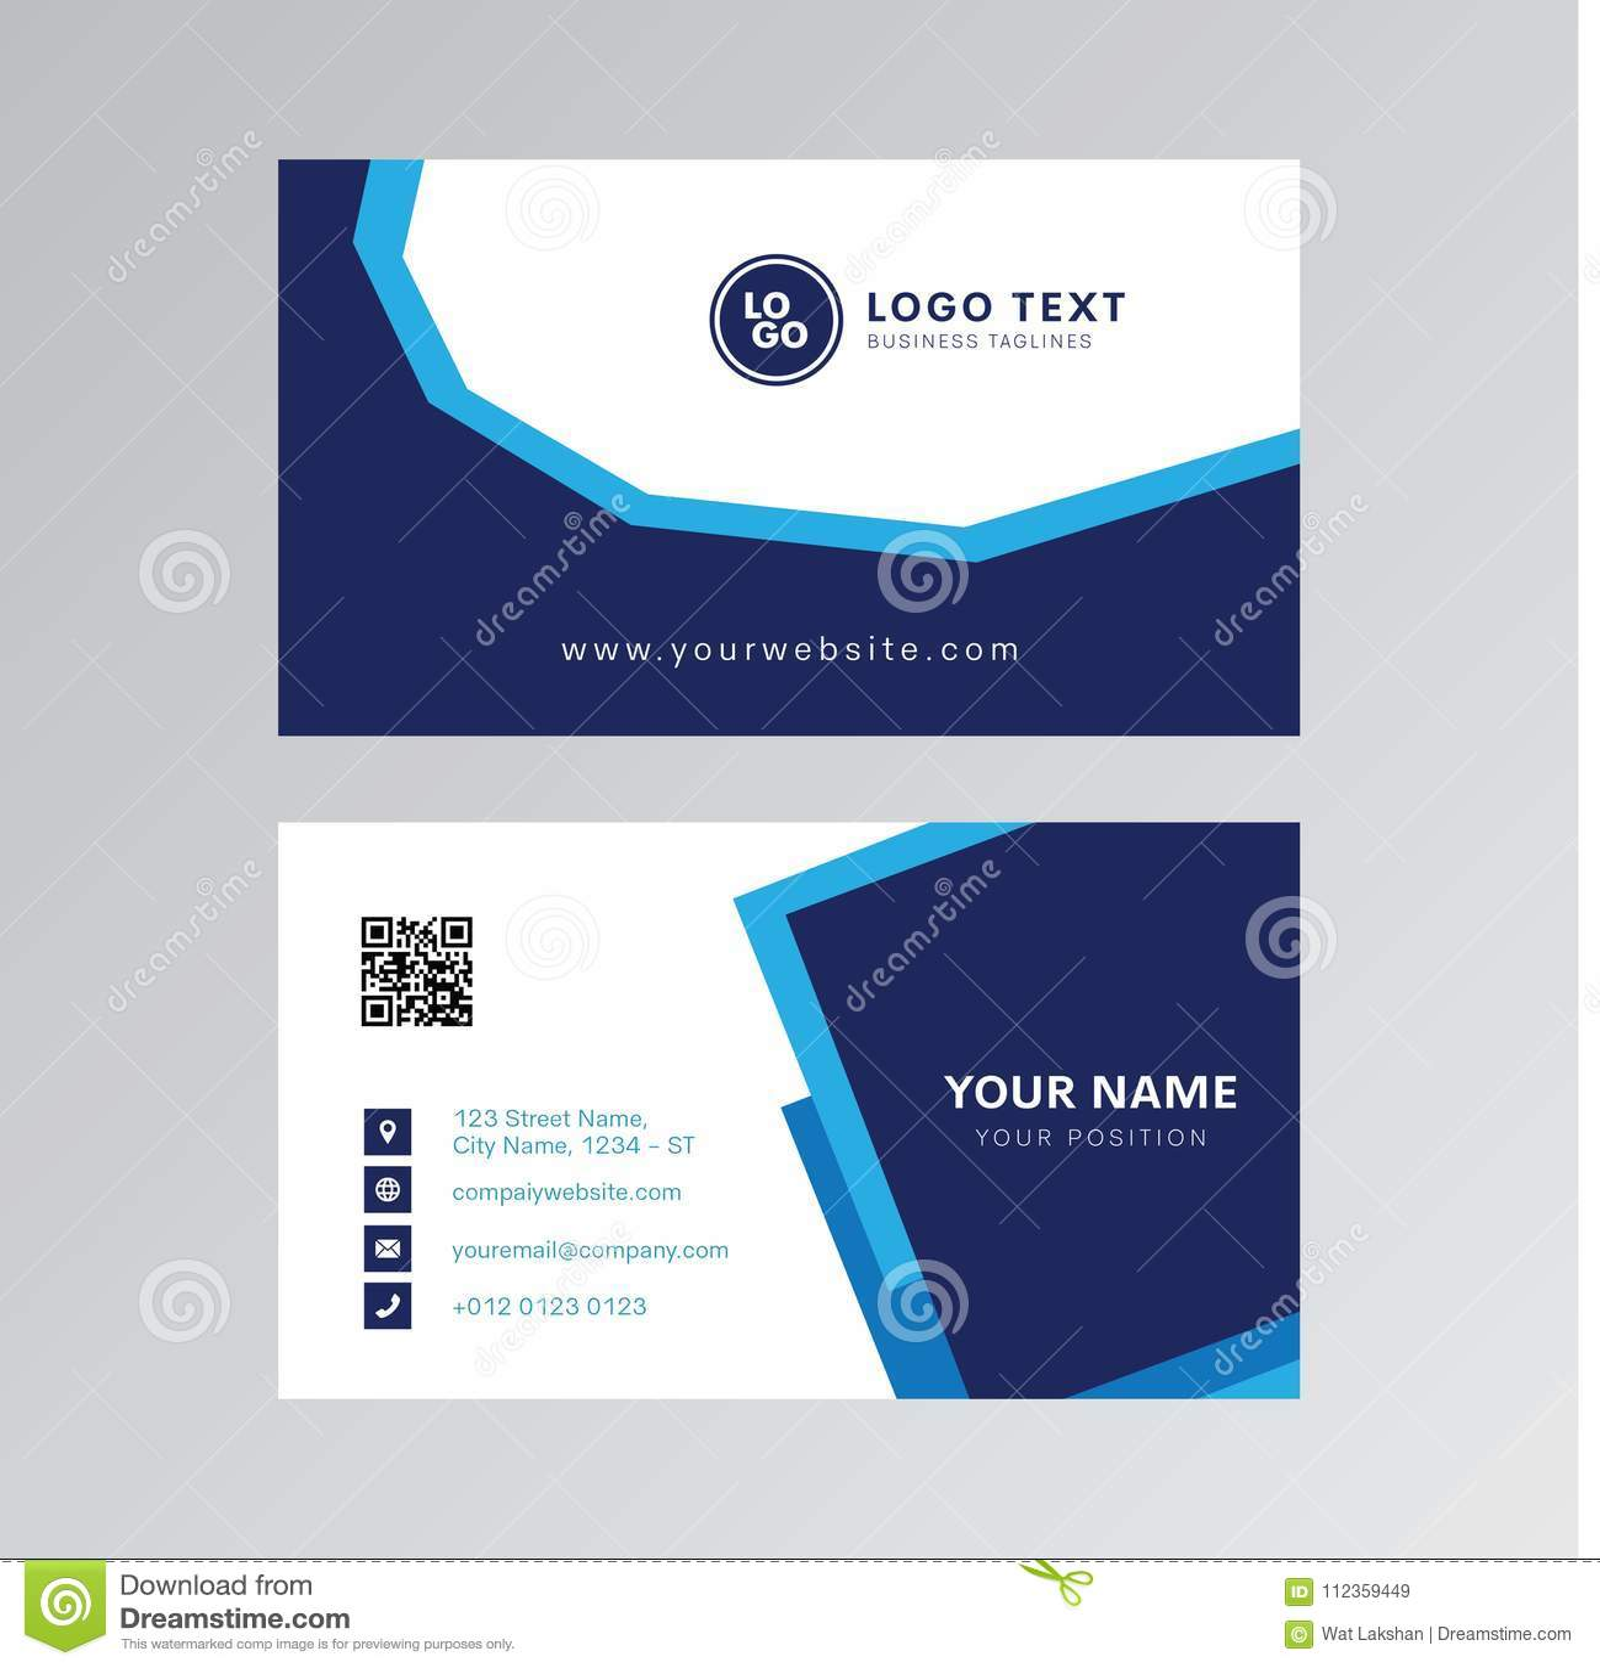 Professional Modern Blue Color Business Card Invitation Card Design Stock  Vector - Illustration of product, design: 112359449